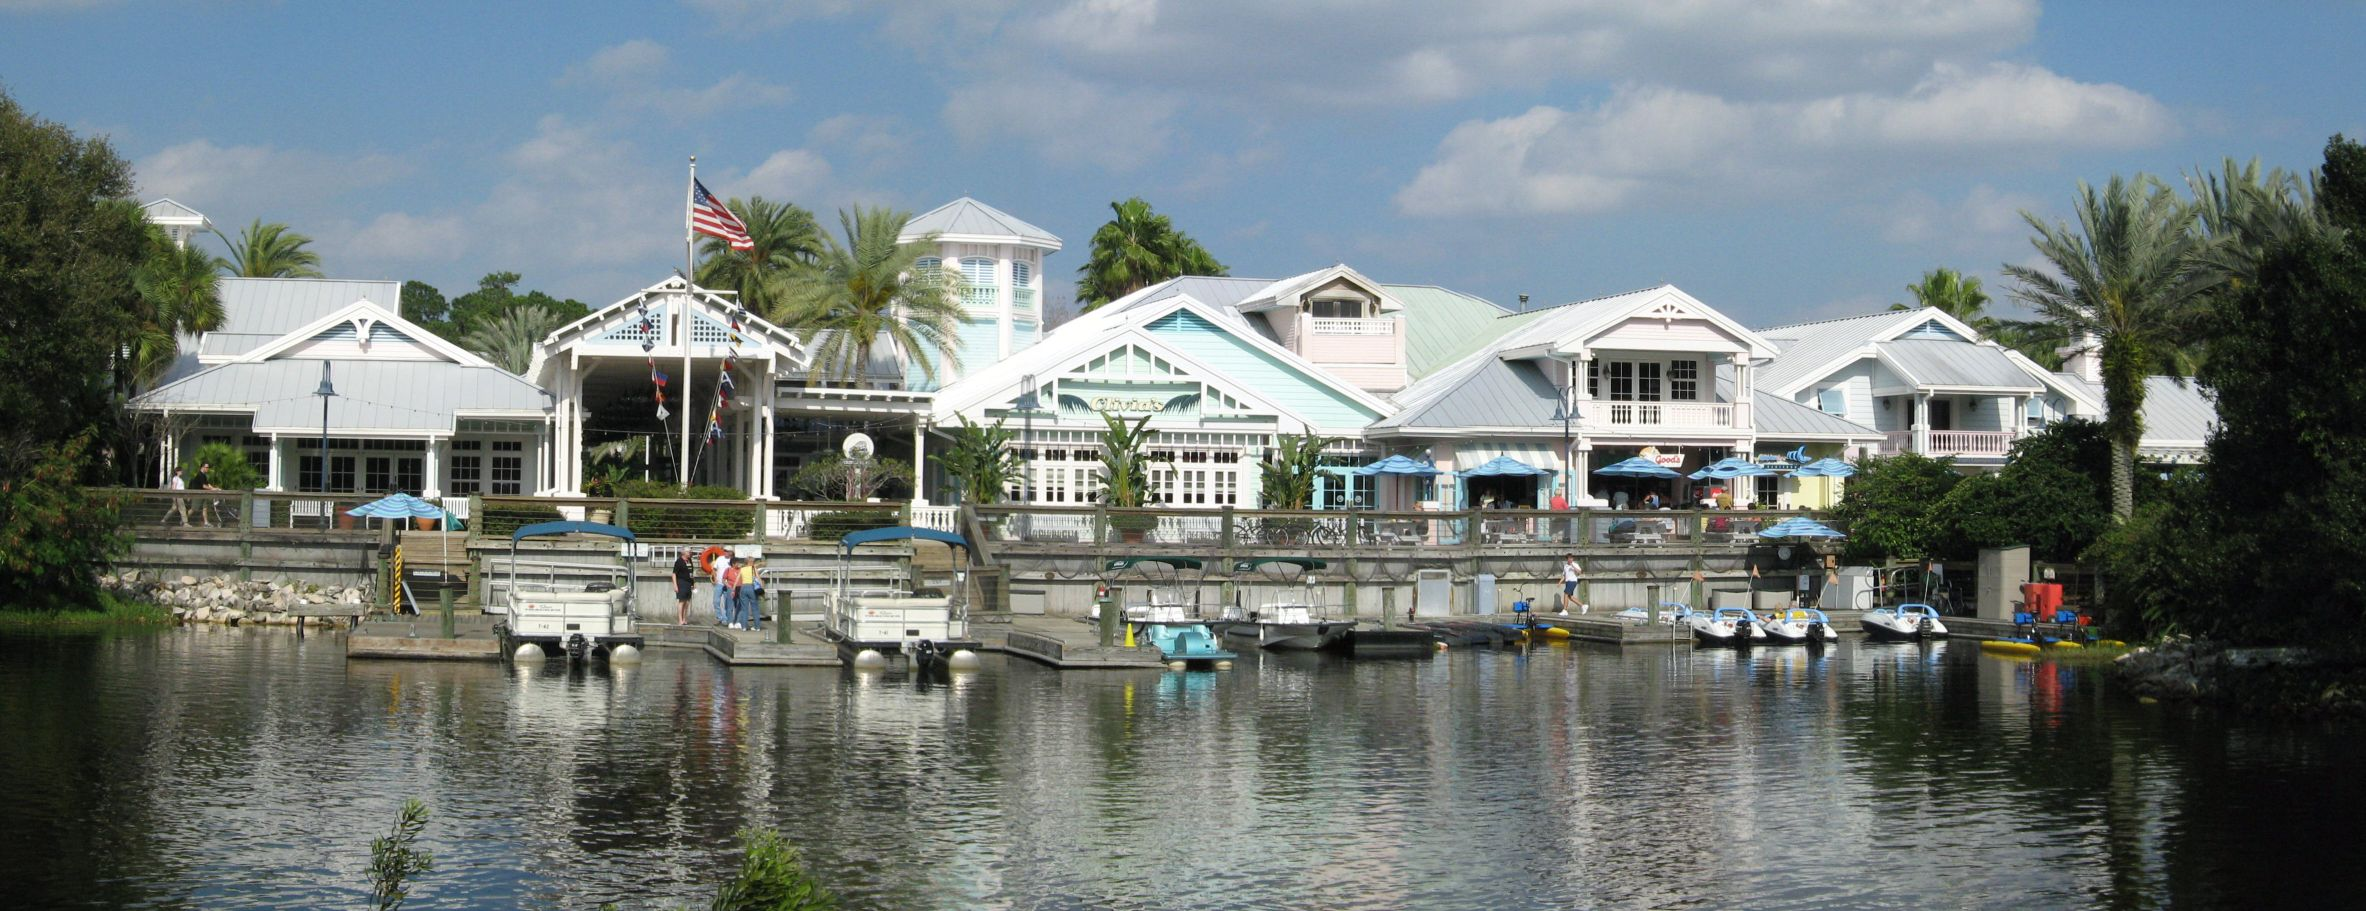 Disney S Old Key West Resort 1 Br Villa